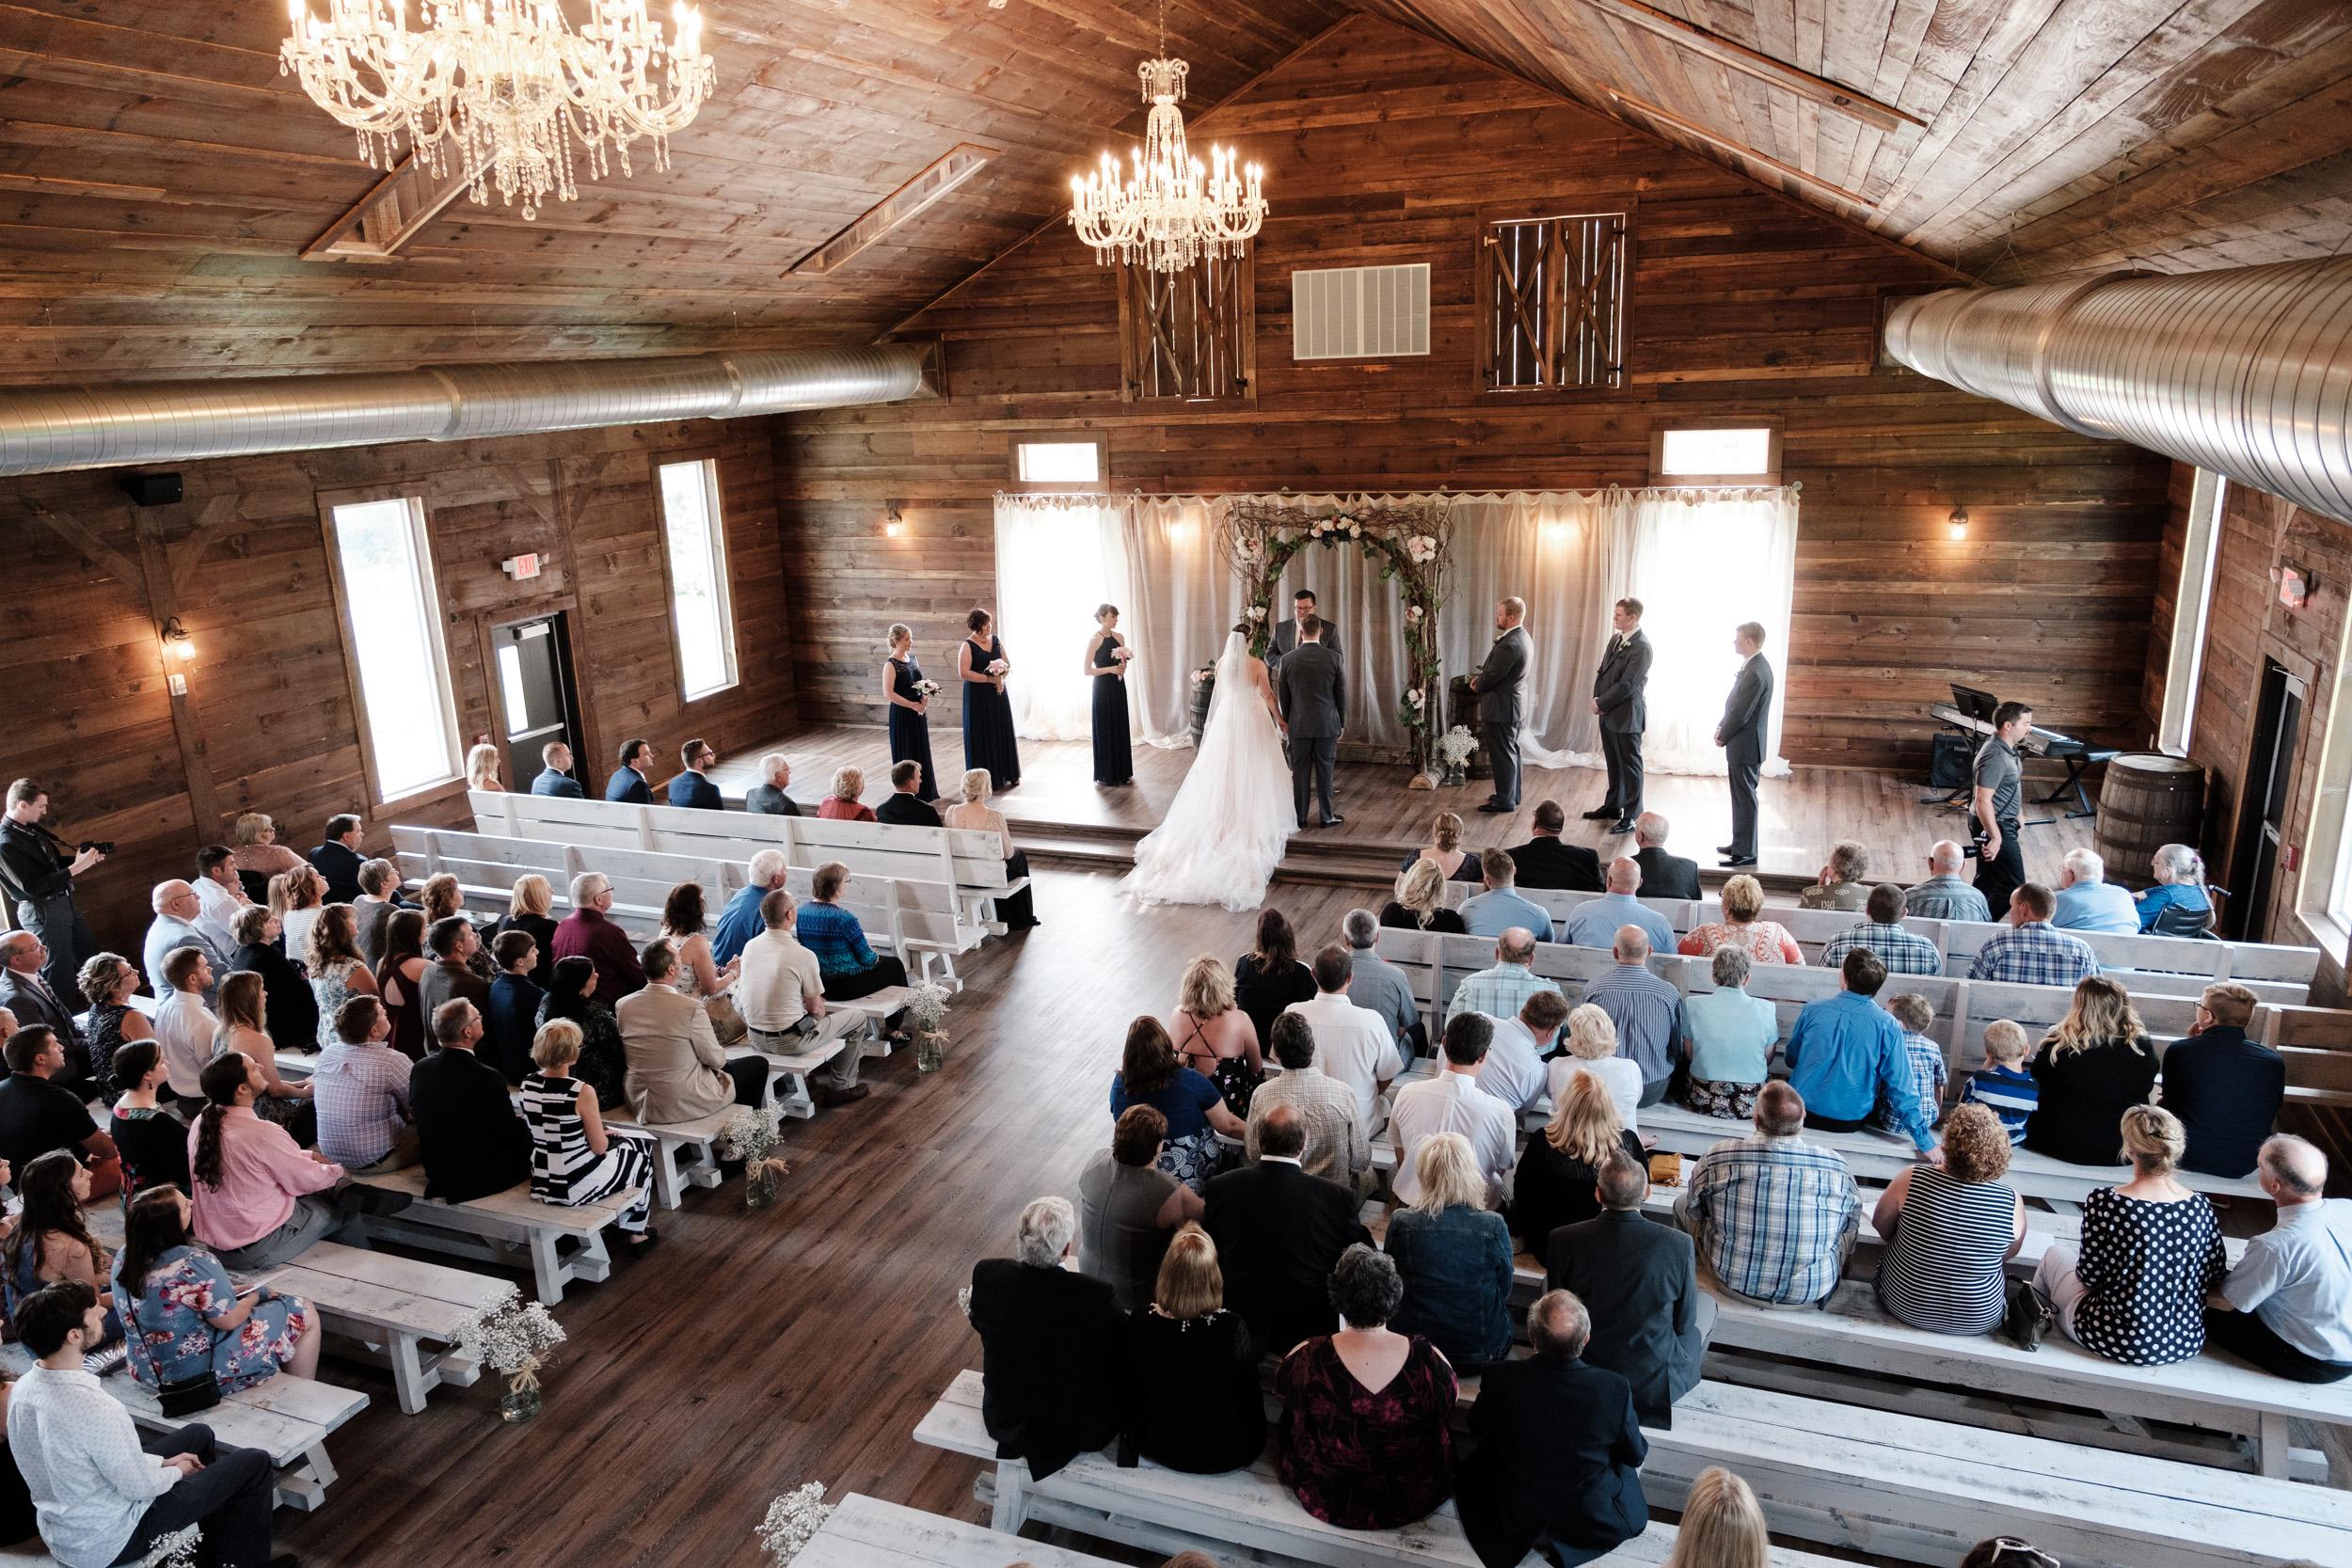 19-06-22-Ryan-Katie-The-Fields-Reserve-Wedding-27.jpg